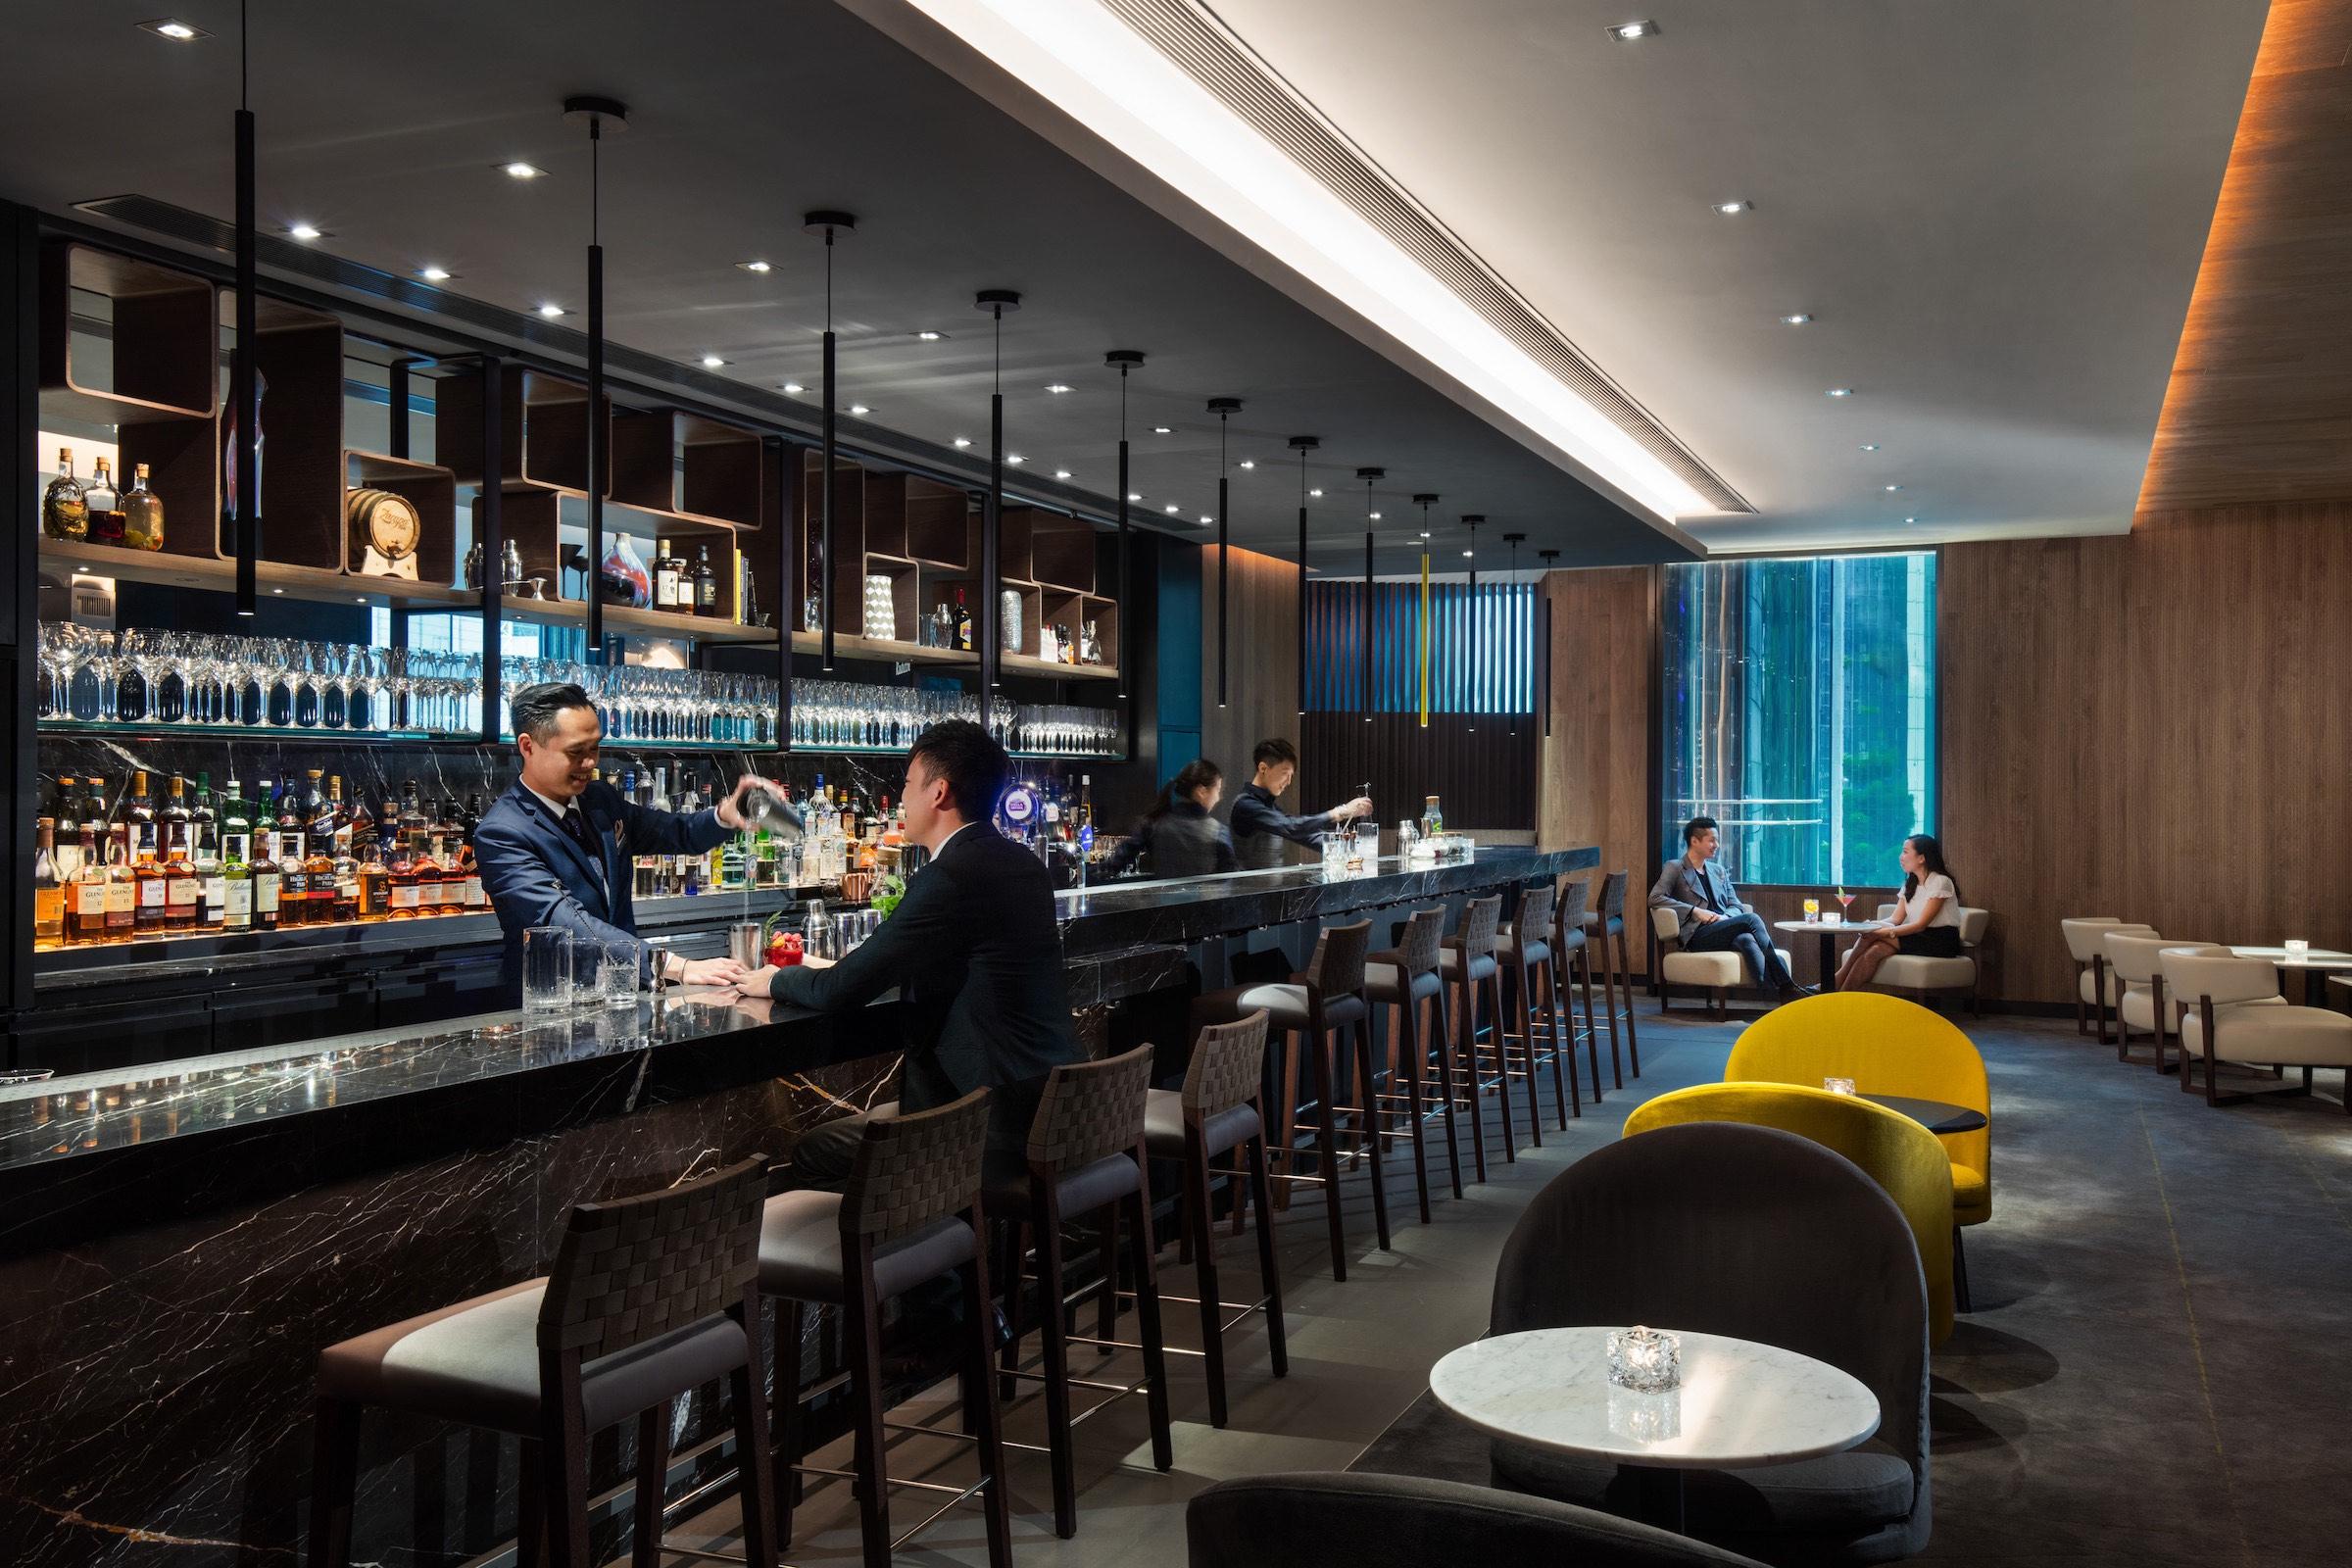 Bar Q88 Cocktail Bar At Jw Marriott Hong Kong Asia